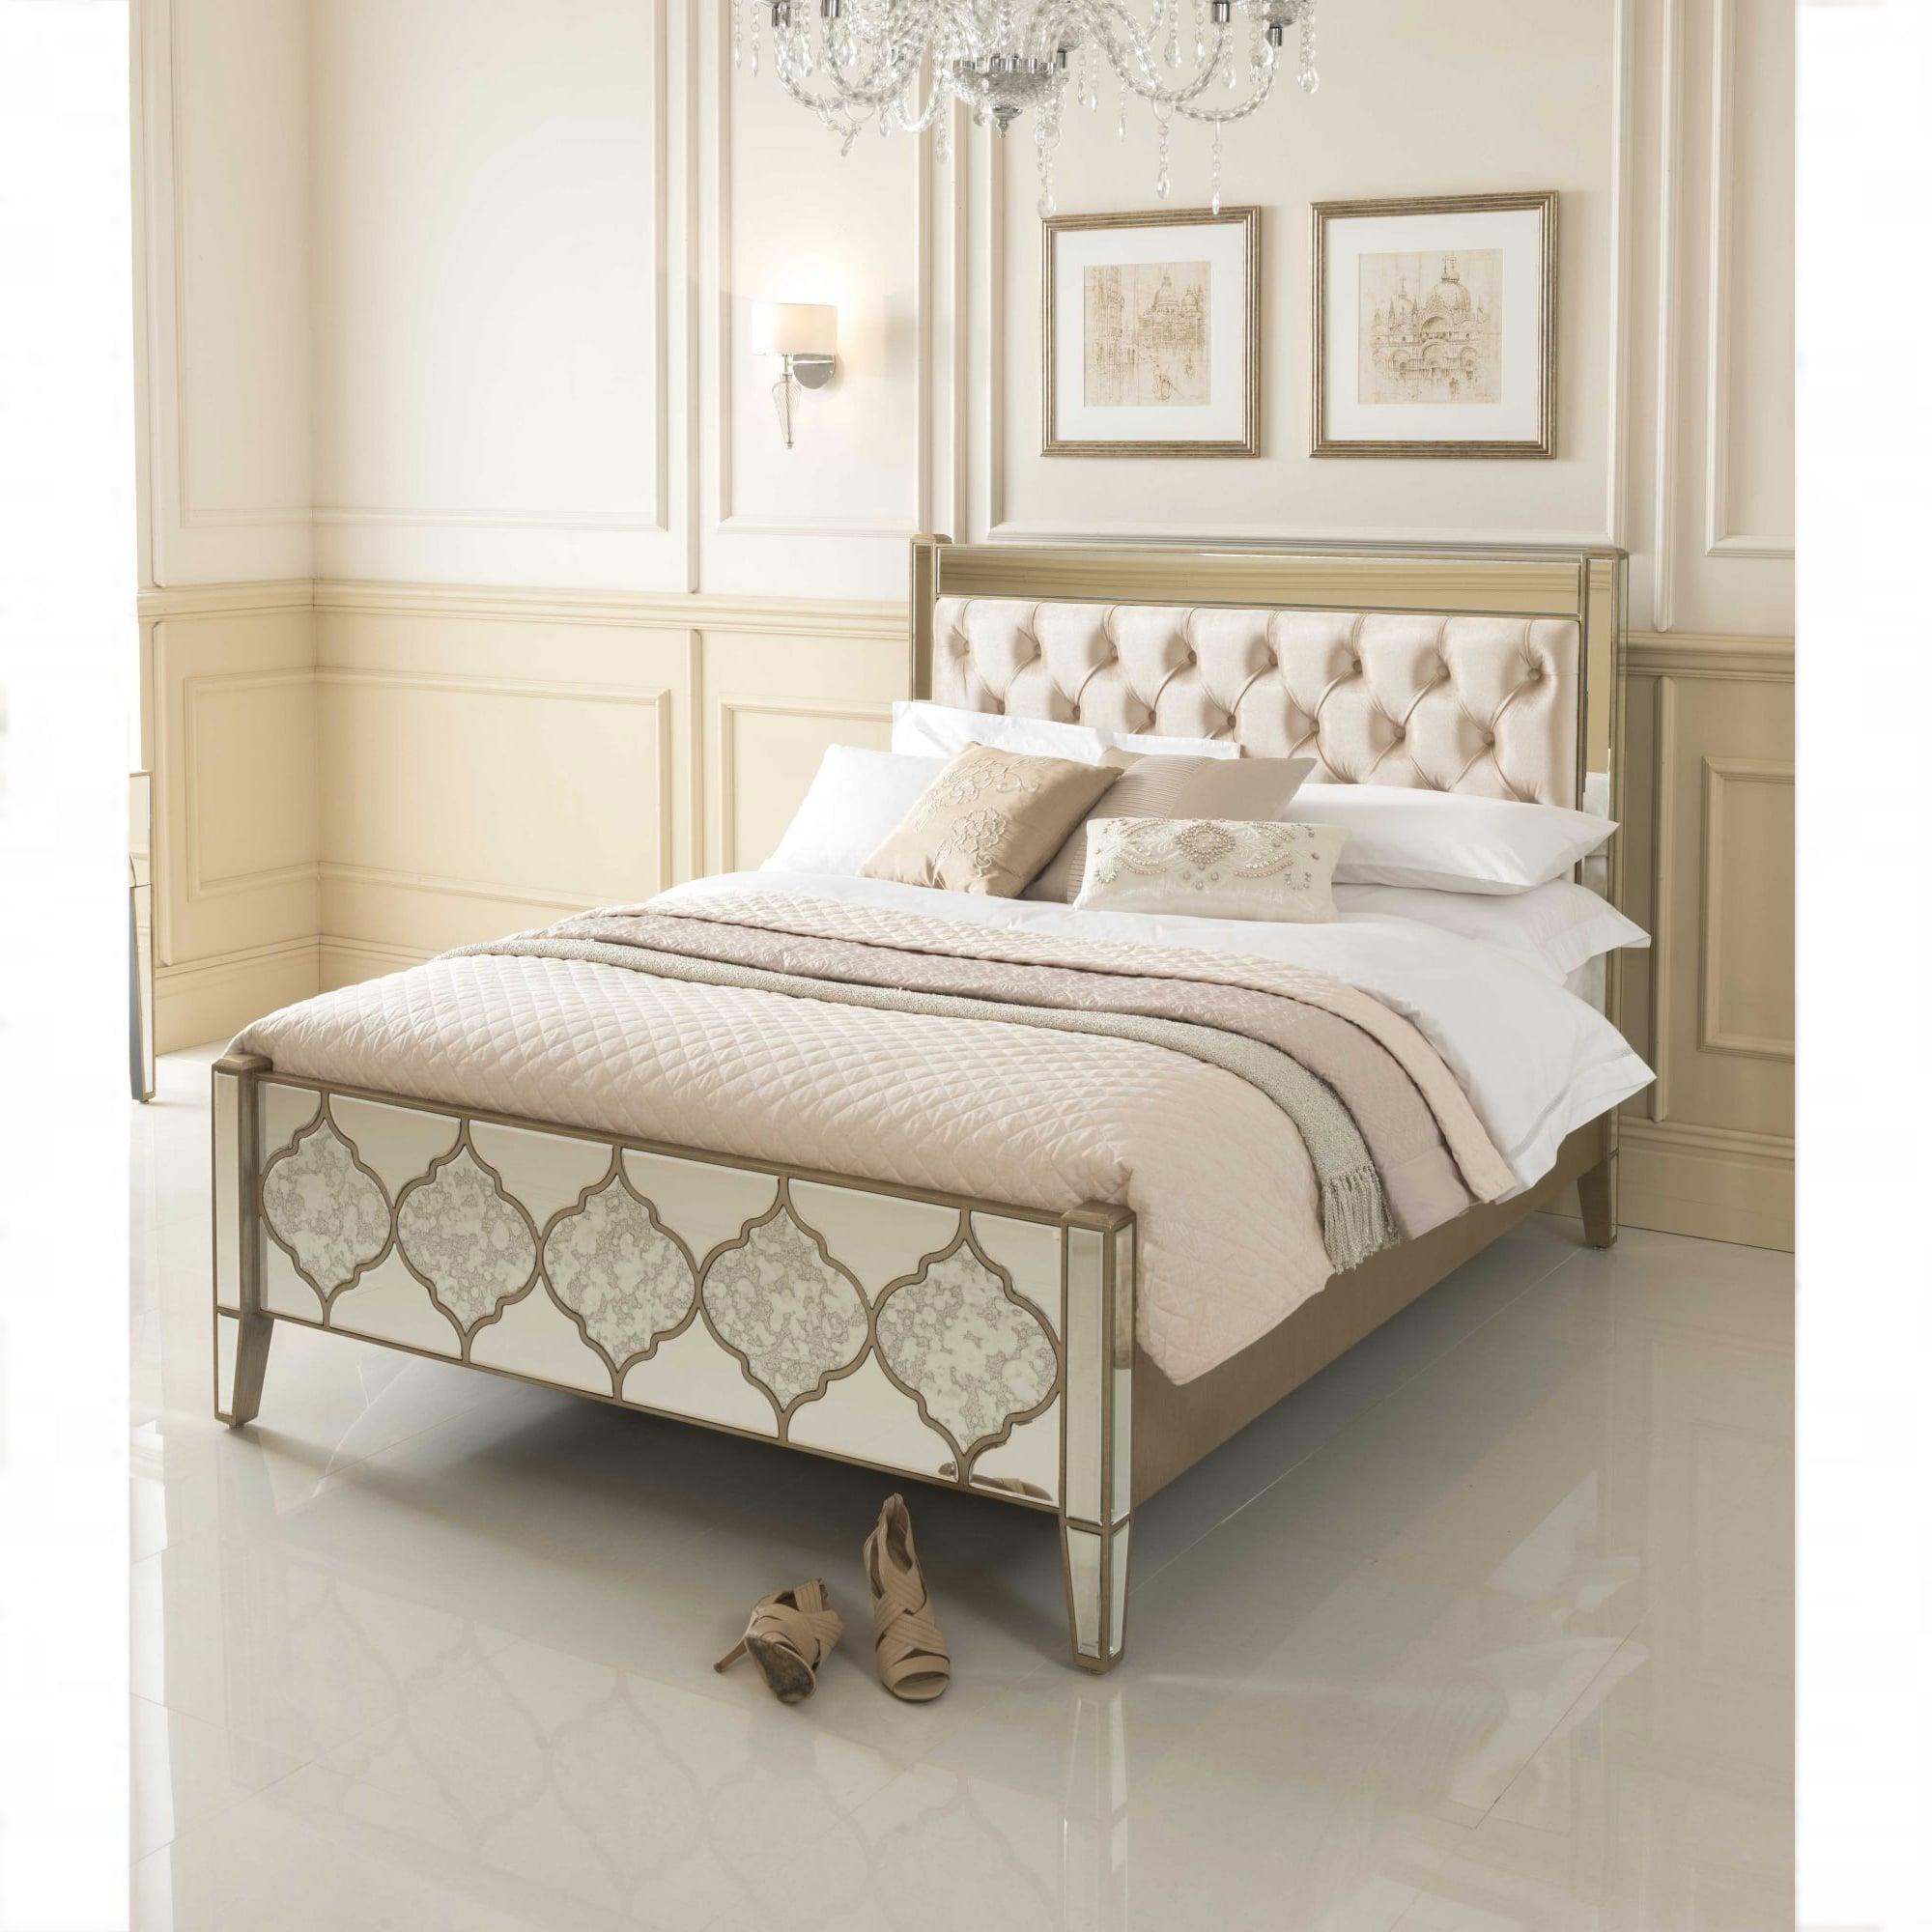 mu p rowley for king bed furniture venetian cynthia hooker prod mirrored